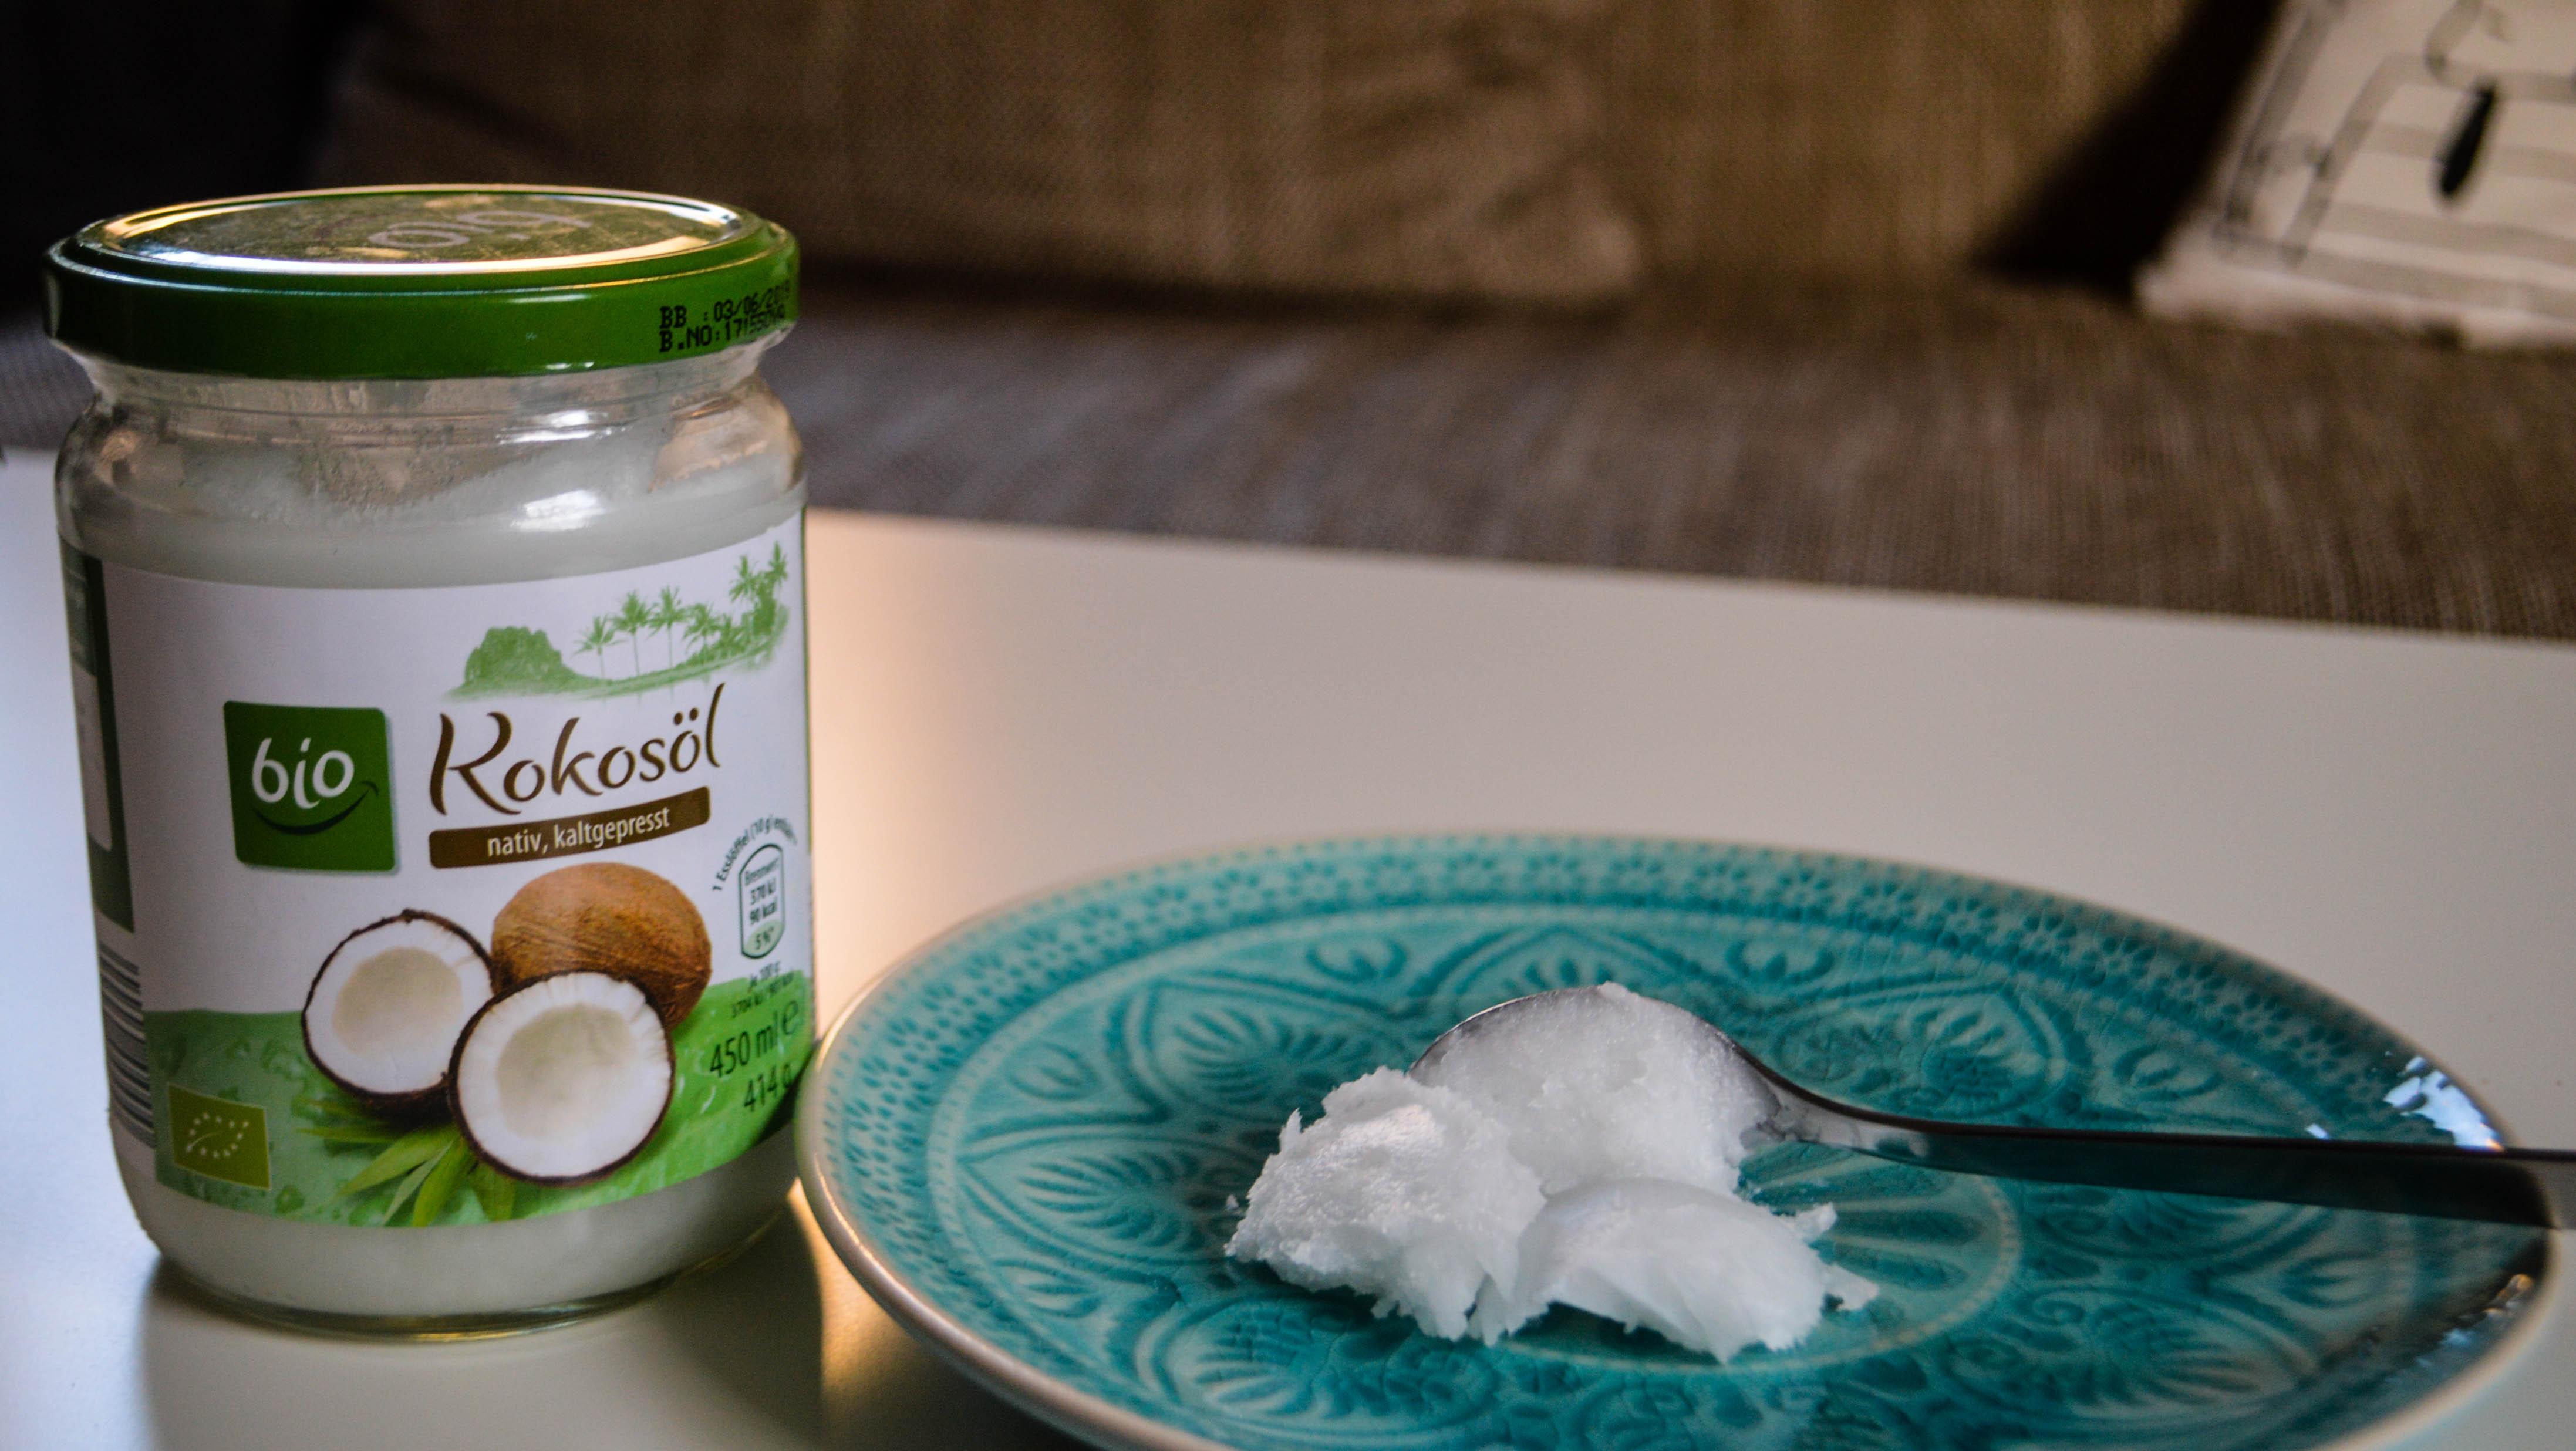 Kokosol haare kaltgepresst